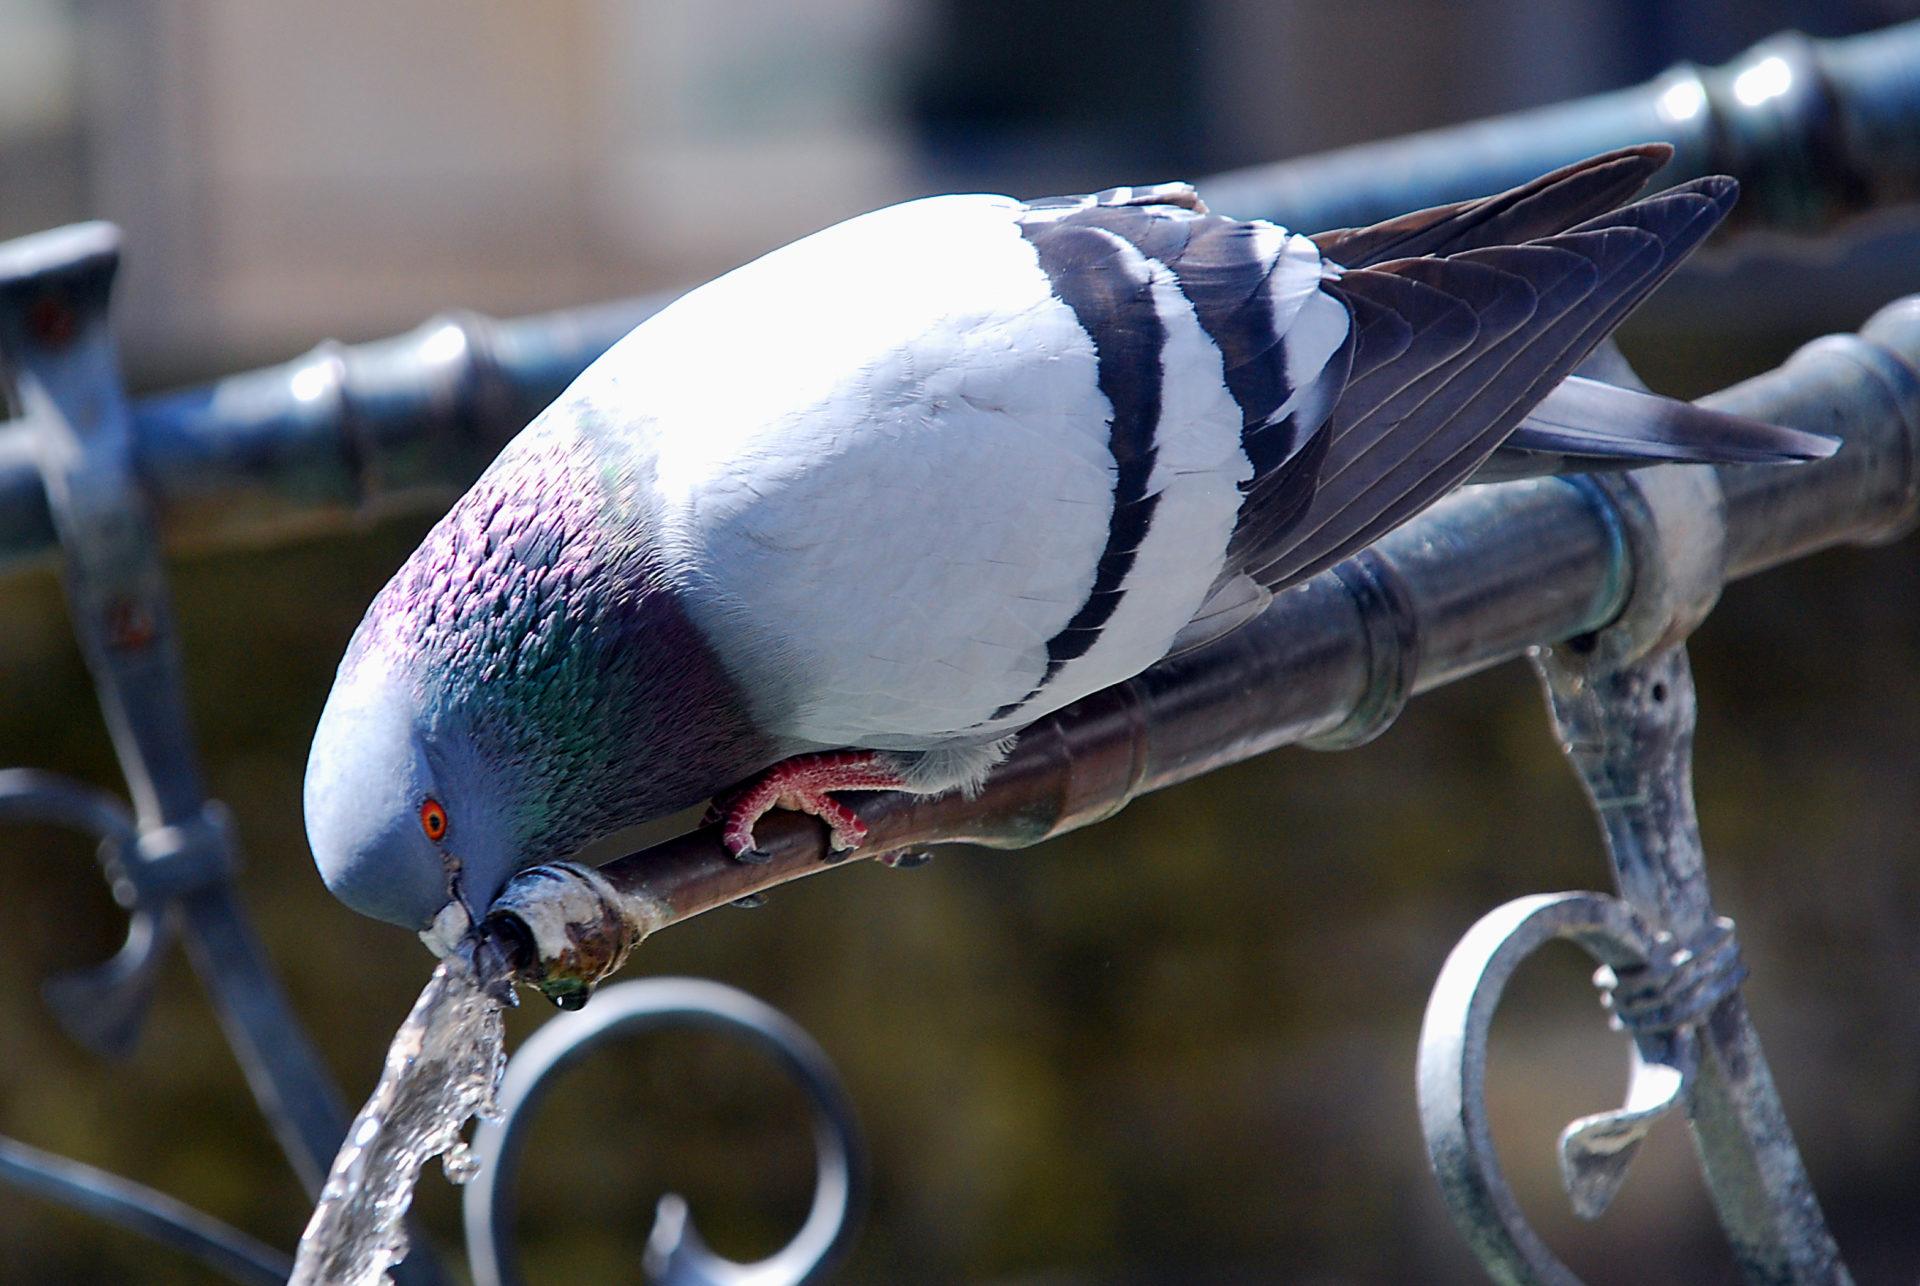 Trinkende Taube